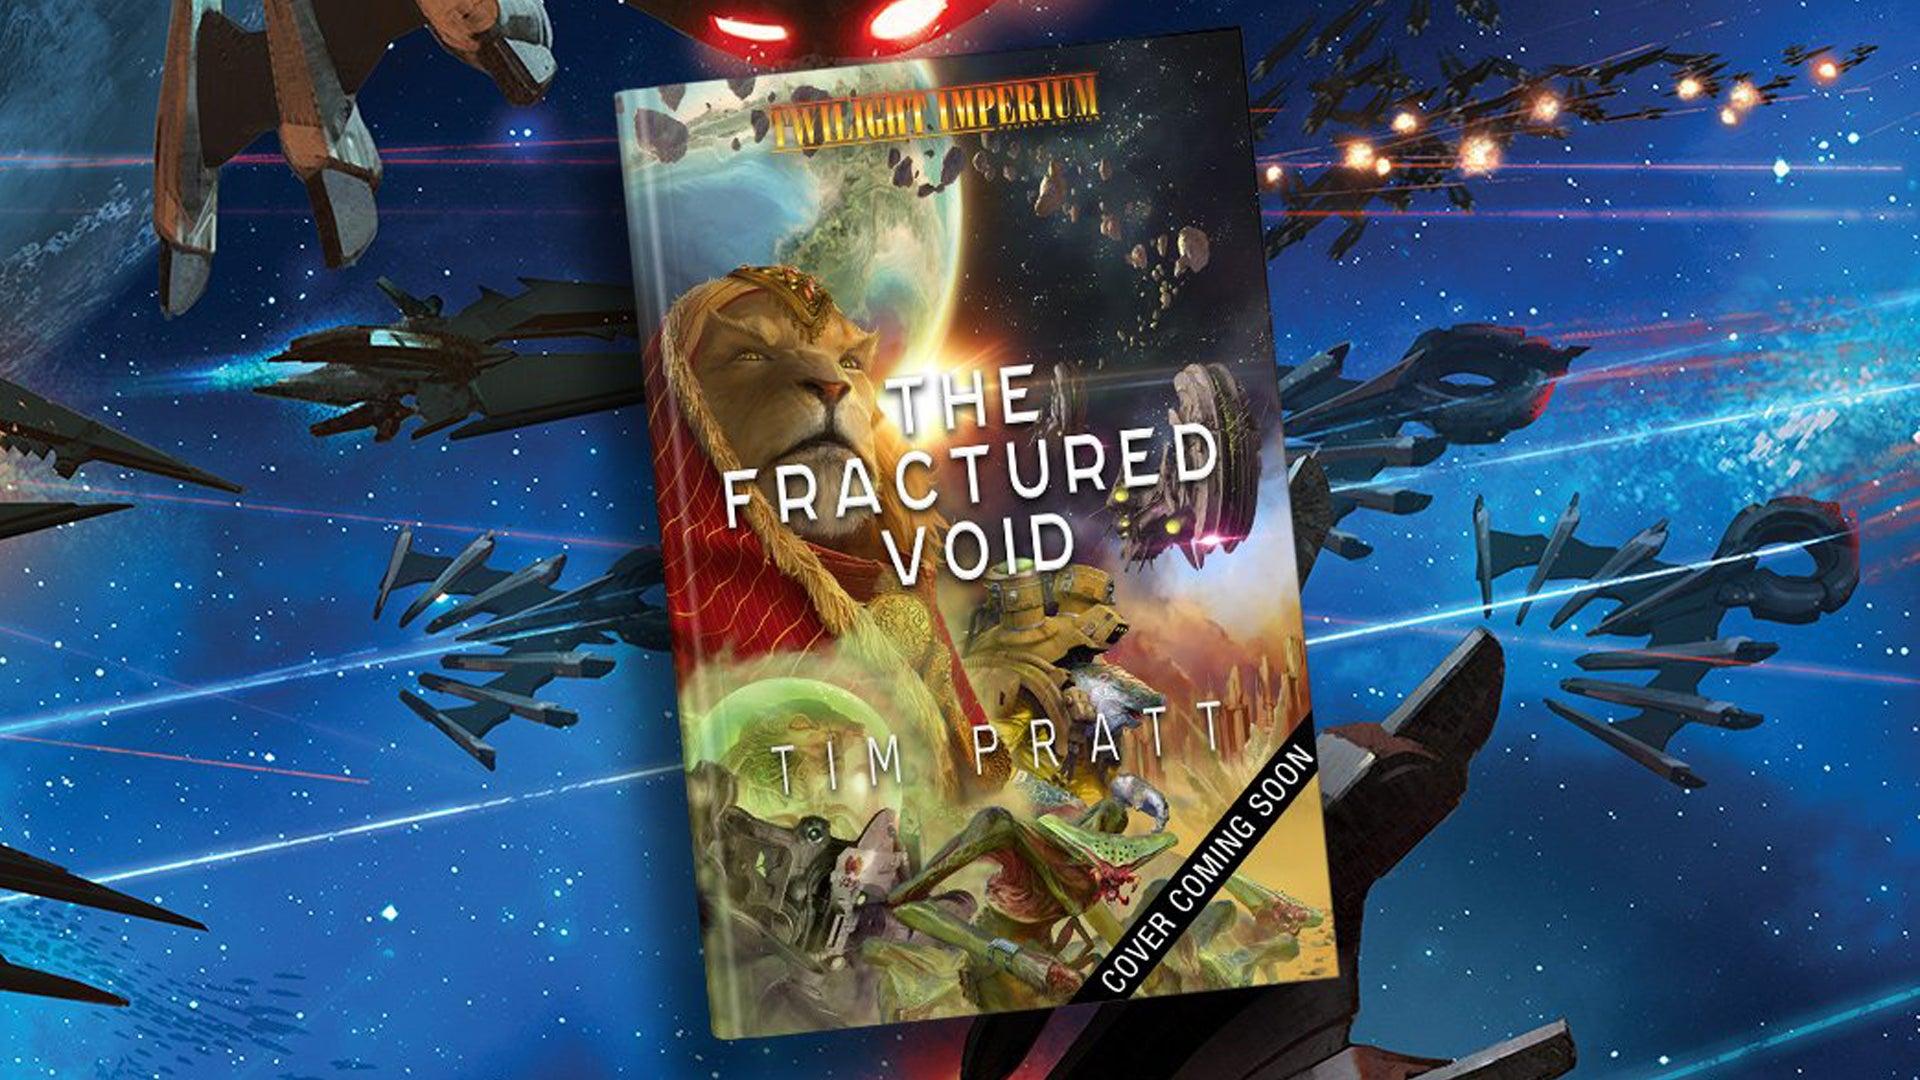 twilight-imperium-the-fractured-void-book.jpg